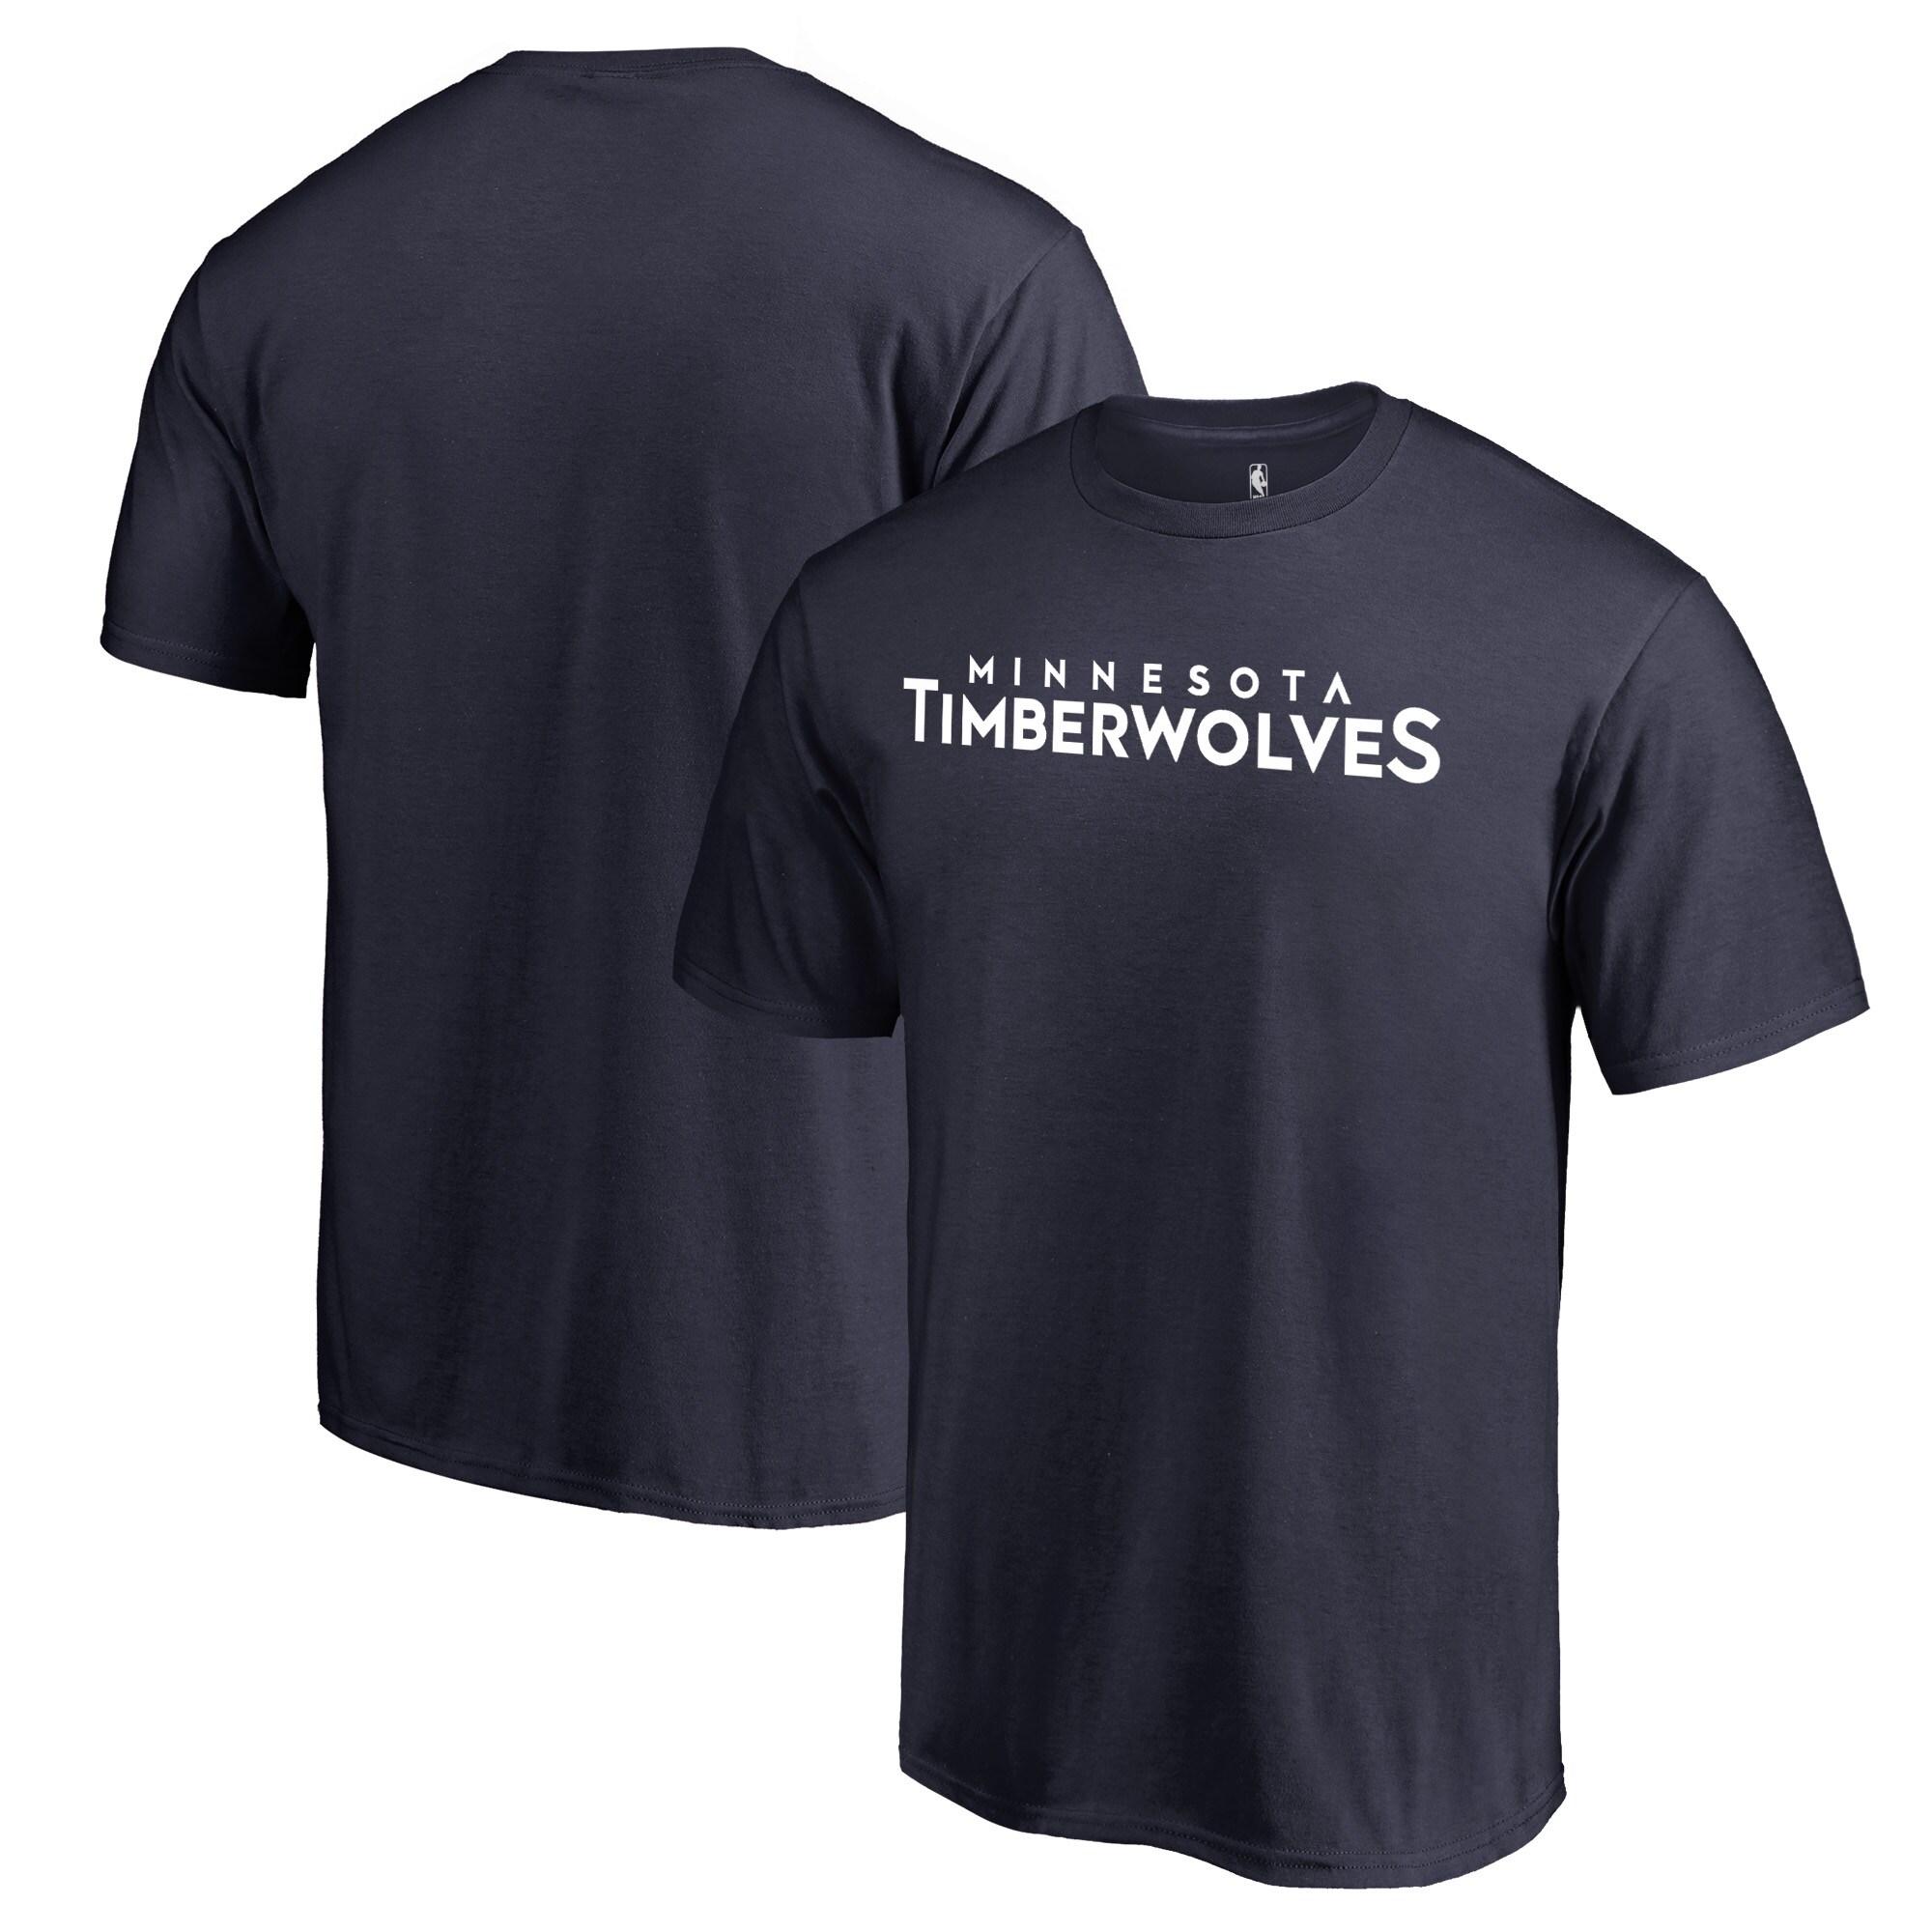 Minnesota Timberwolves Fanatics Branded Primary Wordmark T-Shirt - Navy